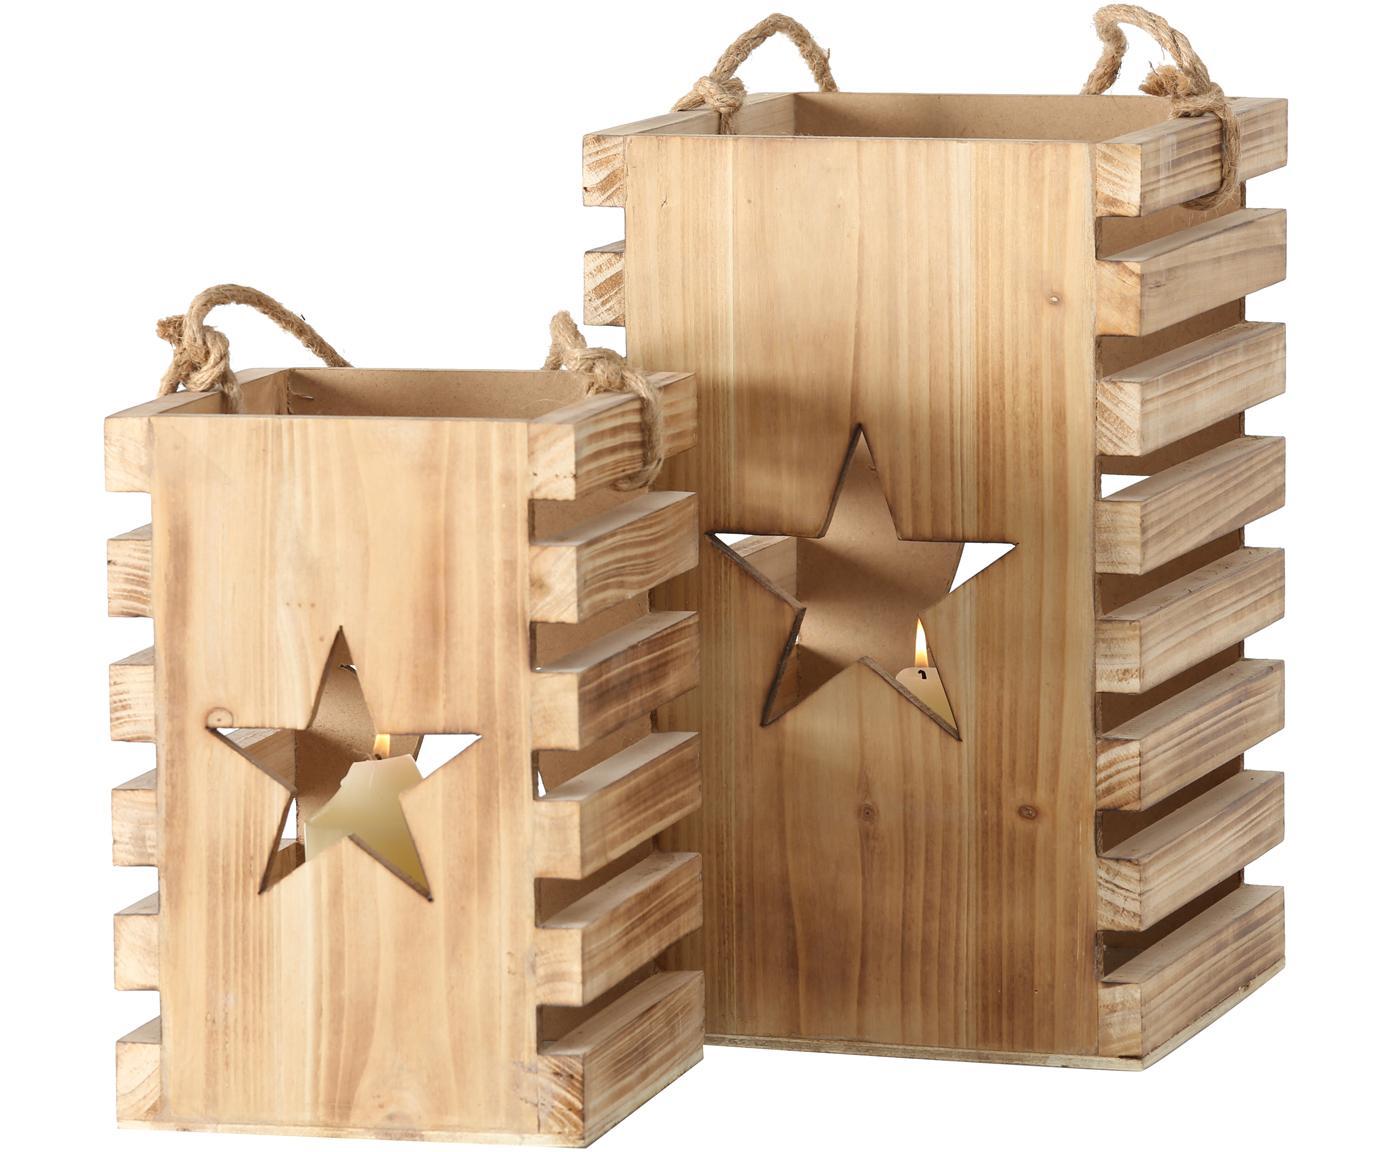 Windlichtenset Etoile, 2-delig, Sparrenhout, Dennenhoutkleurig, Verschillende formaten